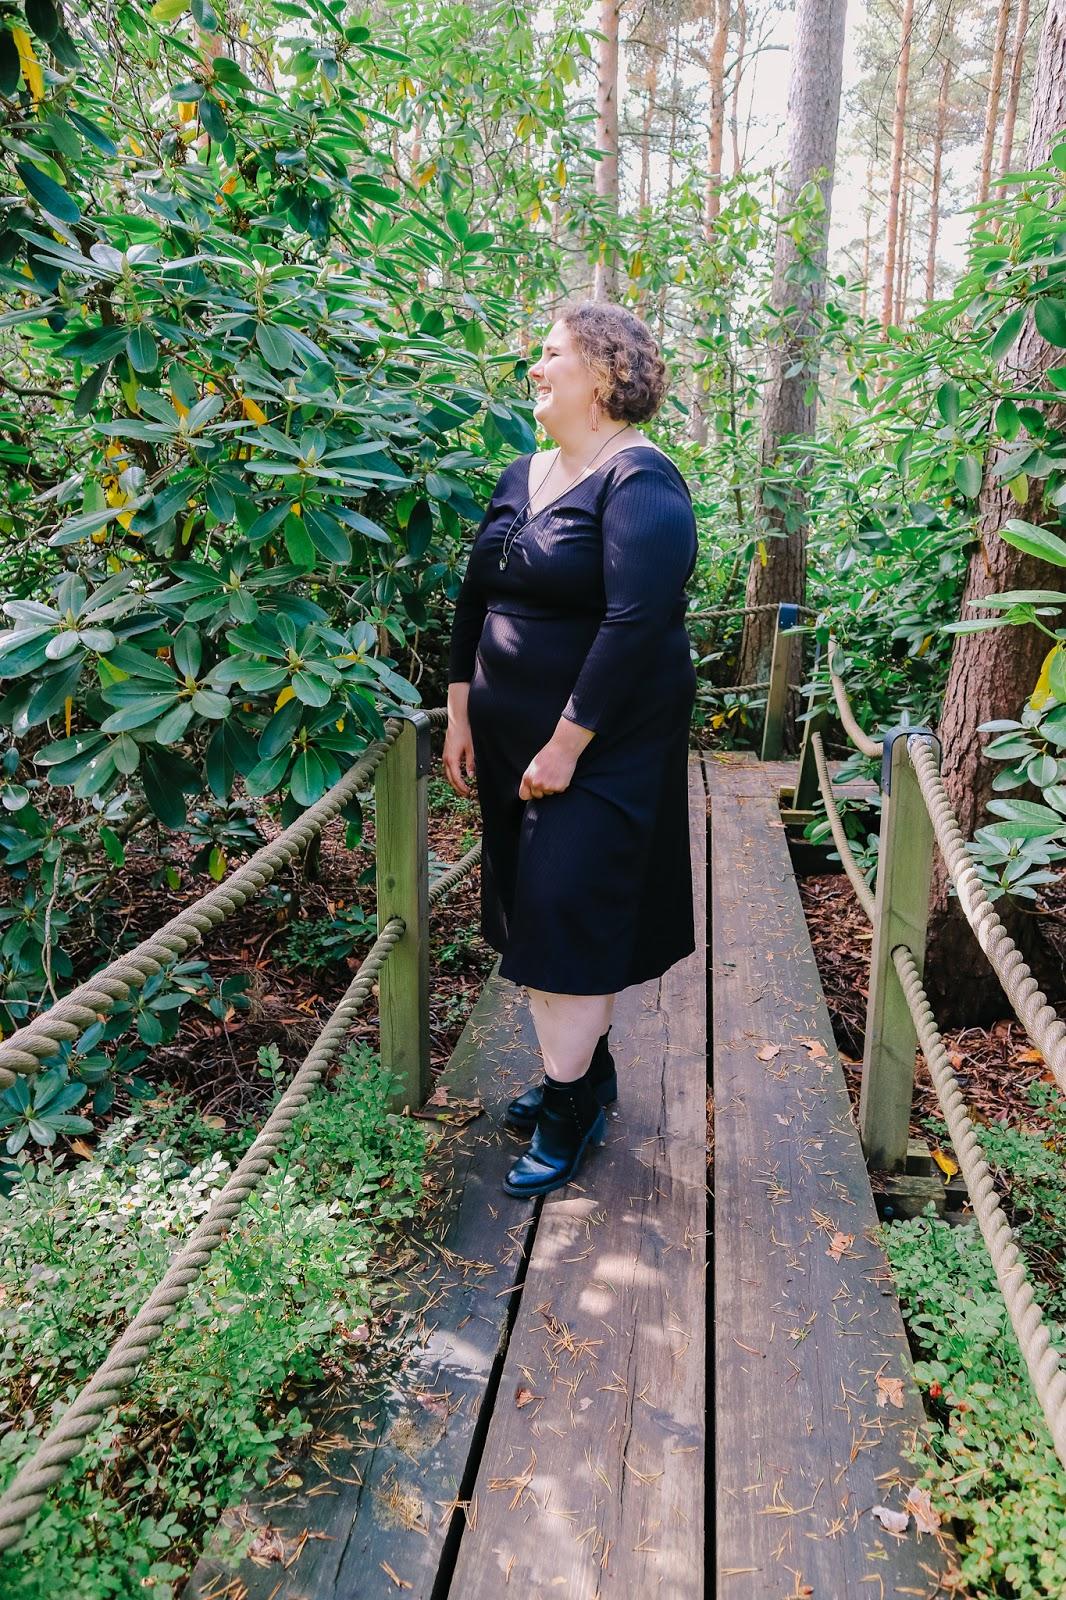 Big mamas home by Jenni S. Meidän Terapian tarpeessa podcast on livenä!